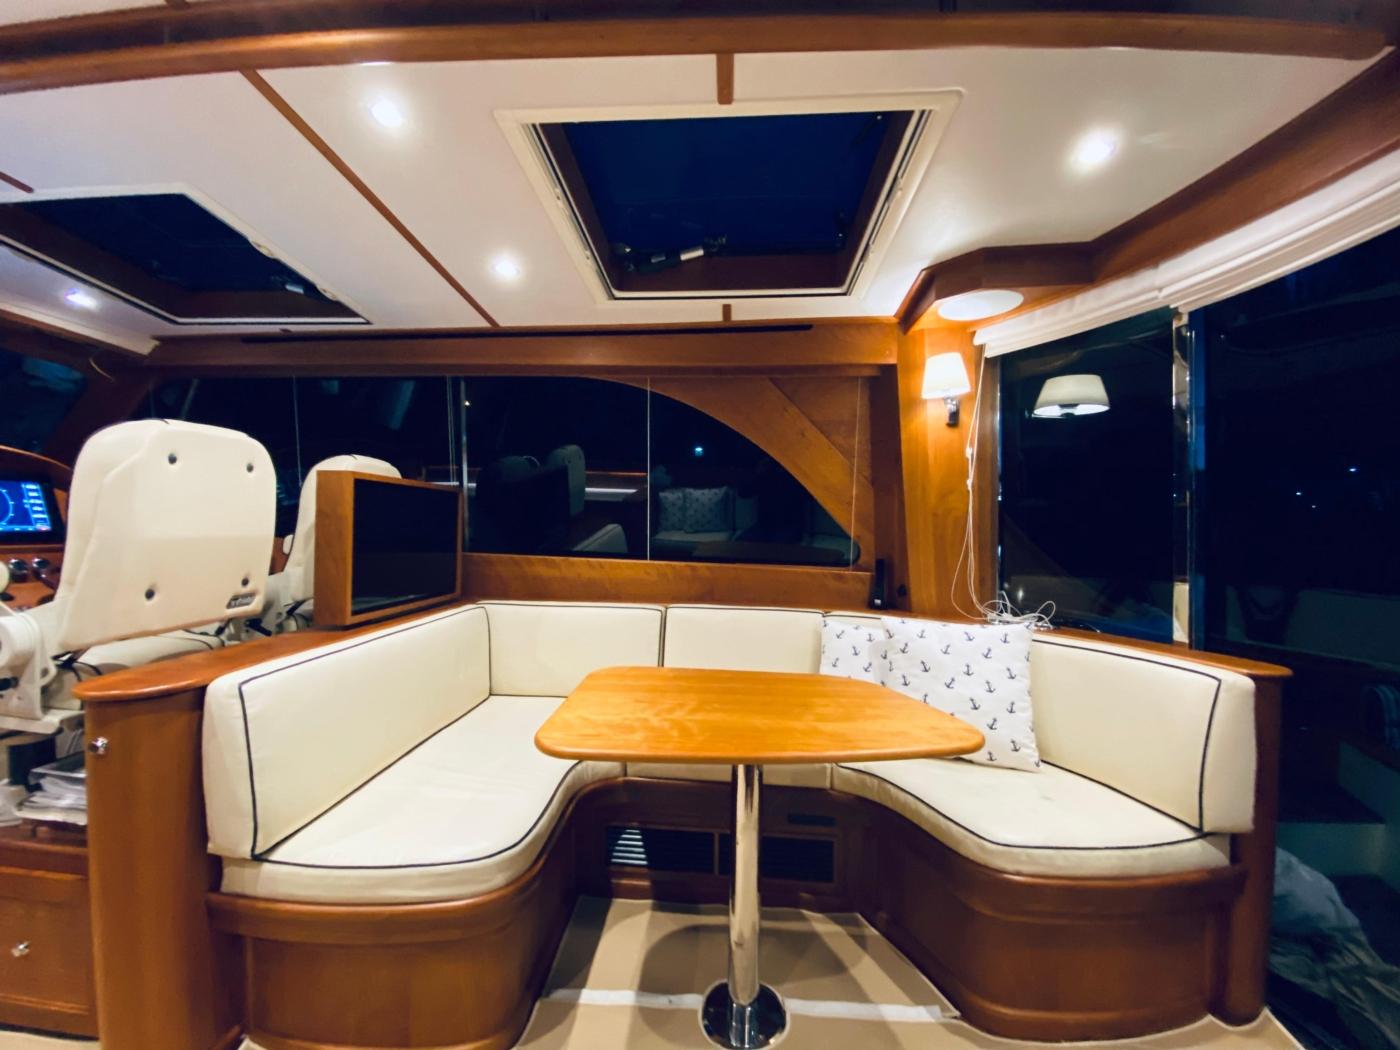 2018 Hinckley Talaria 48 MKII, Salon starboard settee